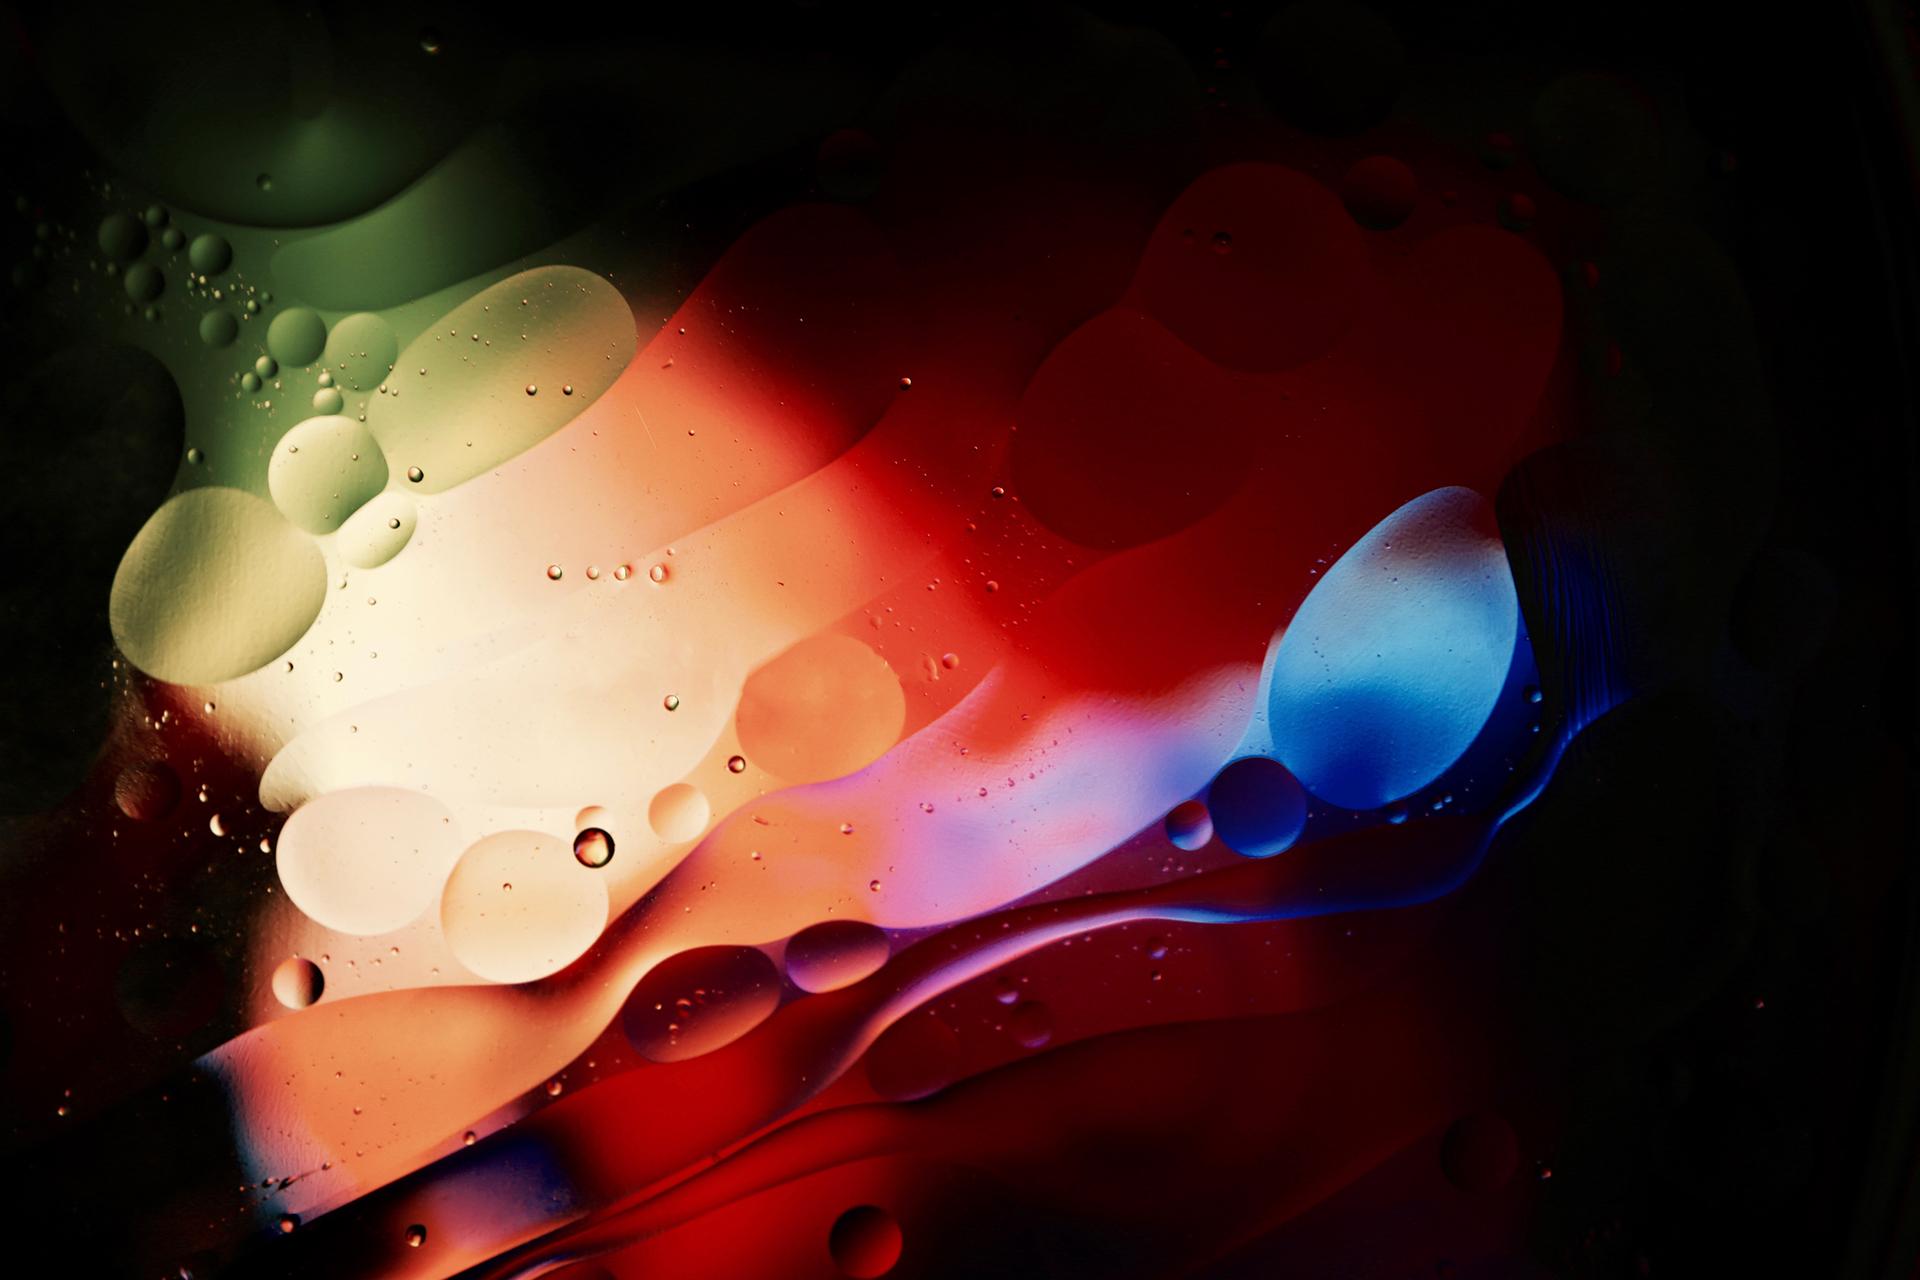 Пузыри / Bubbles by Nik Patel